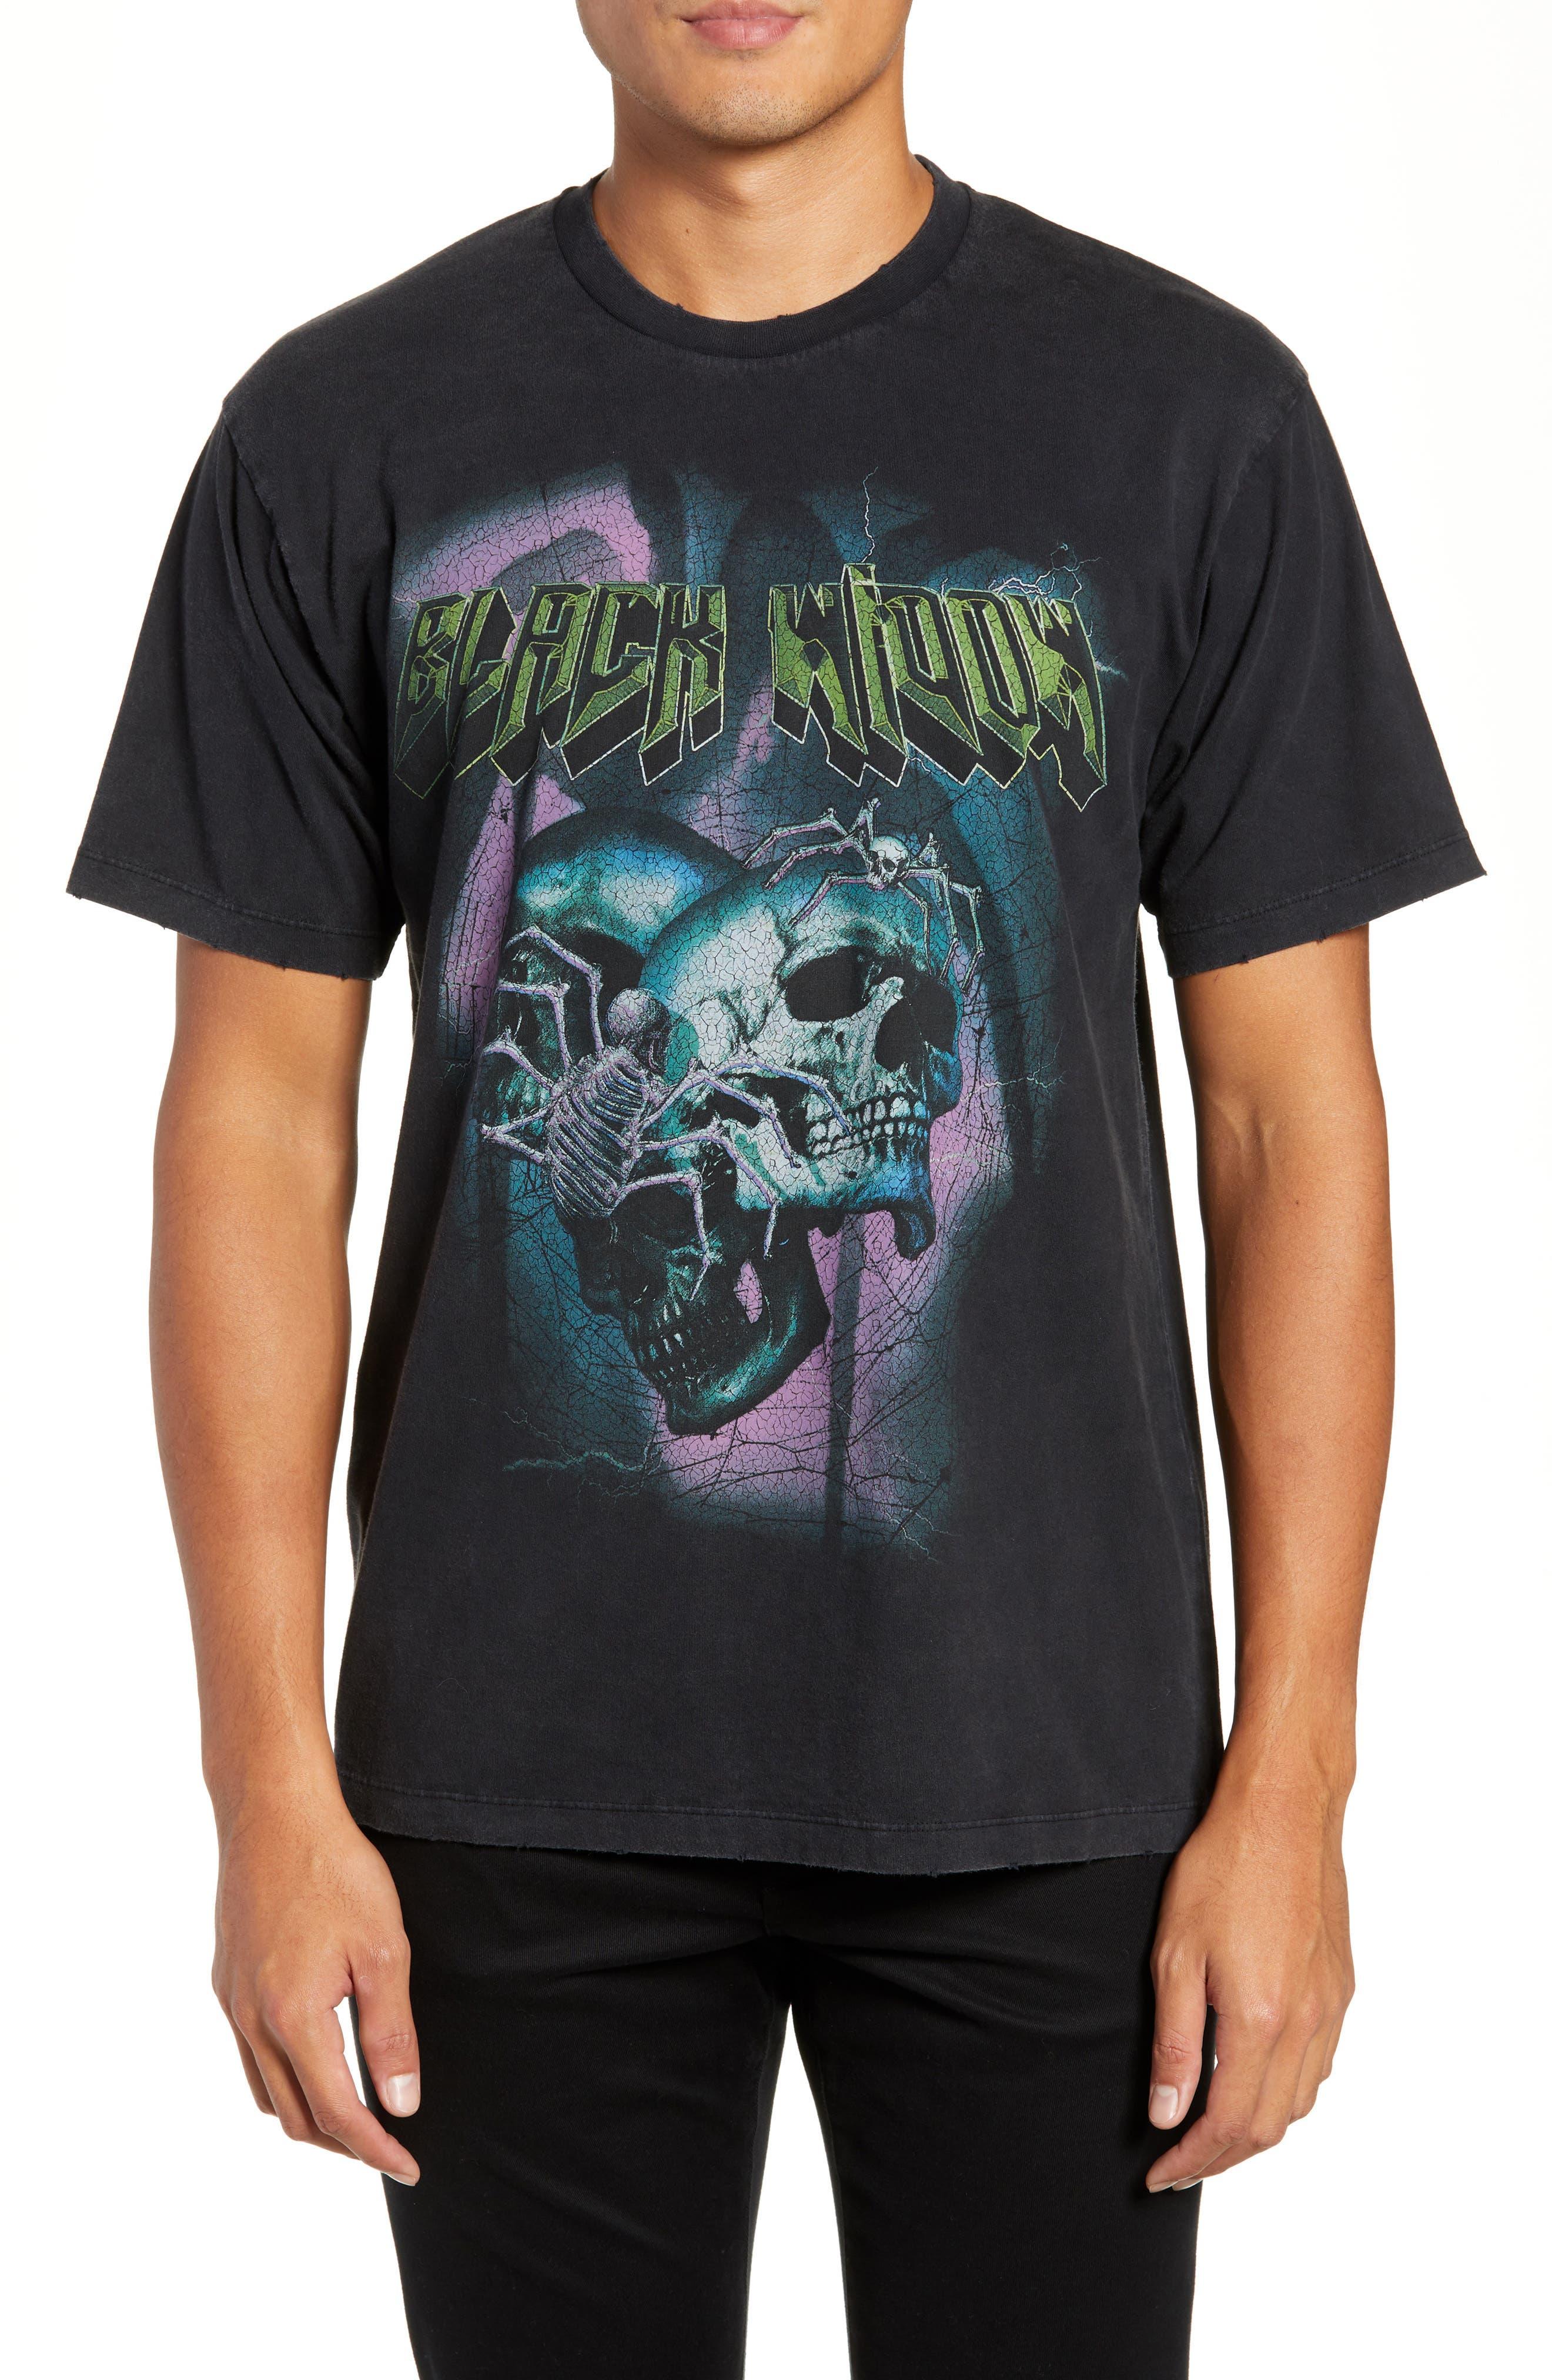 Black Widow Graphic T-Shirt,                             Main thumbnail 1, color,                             001